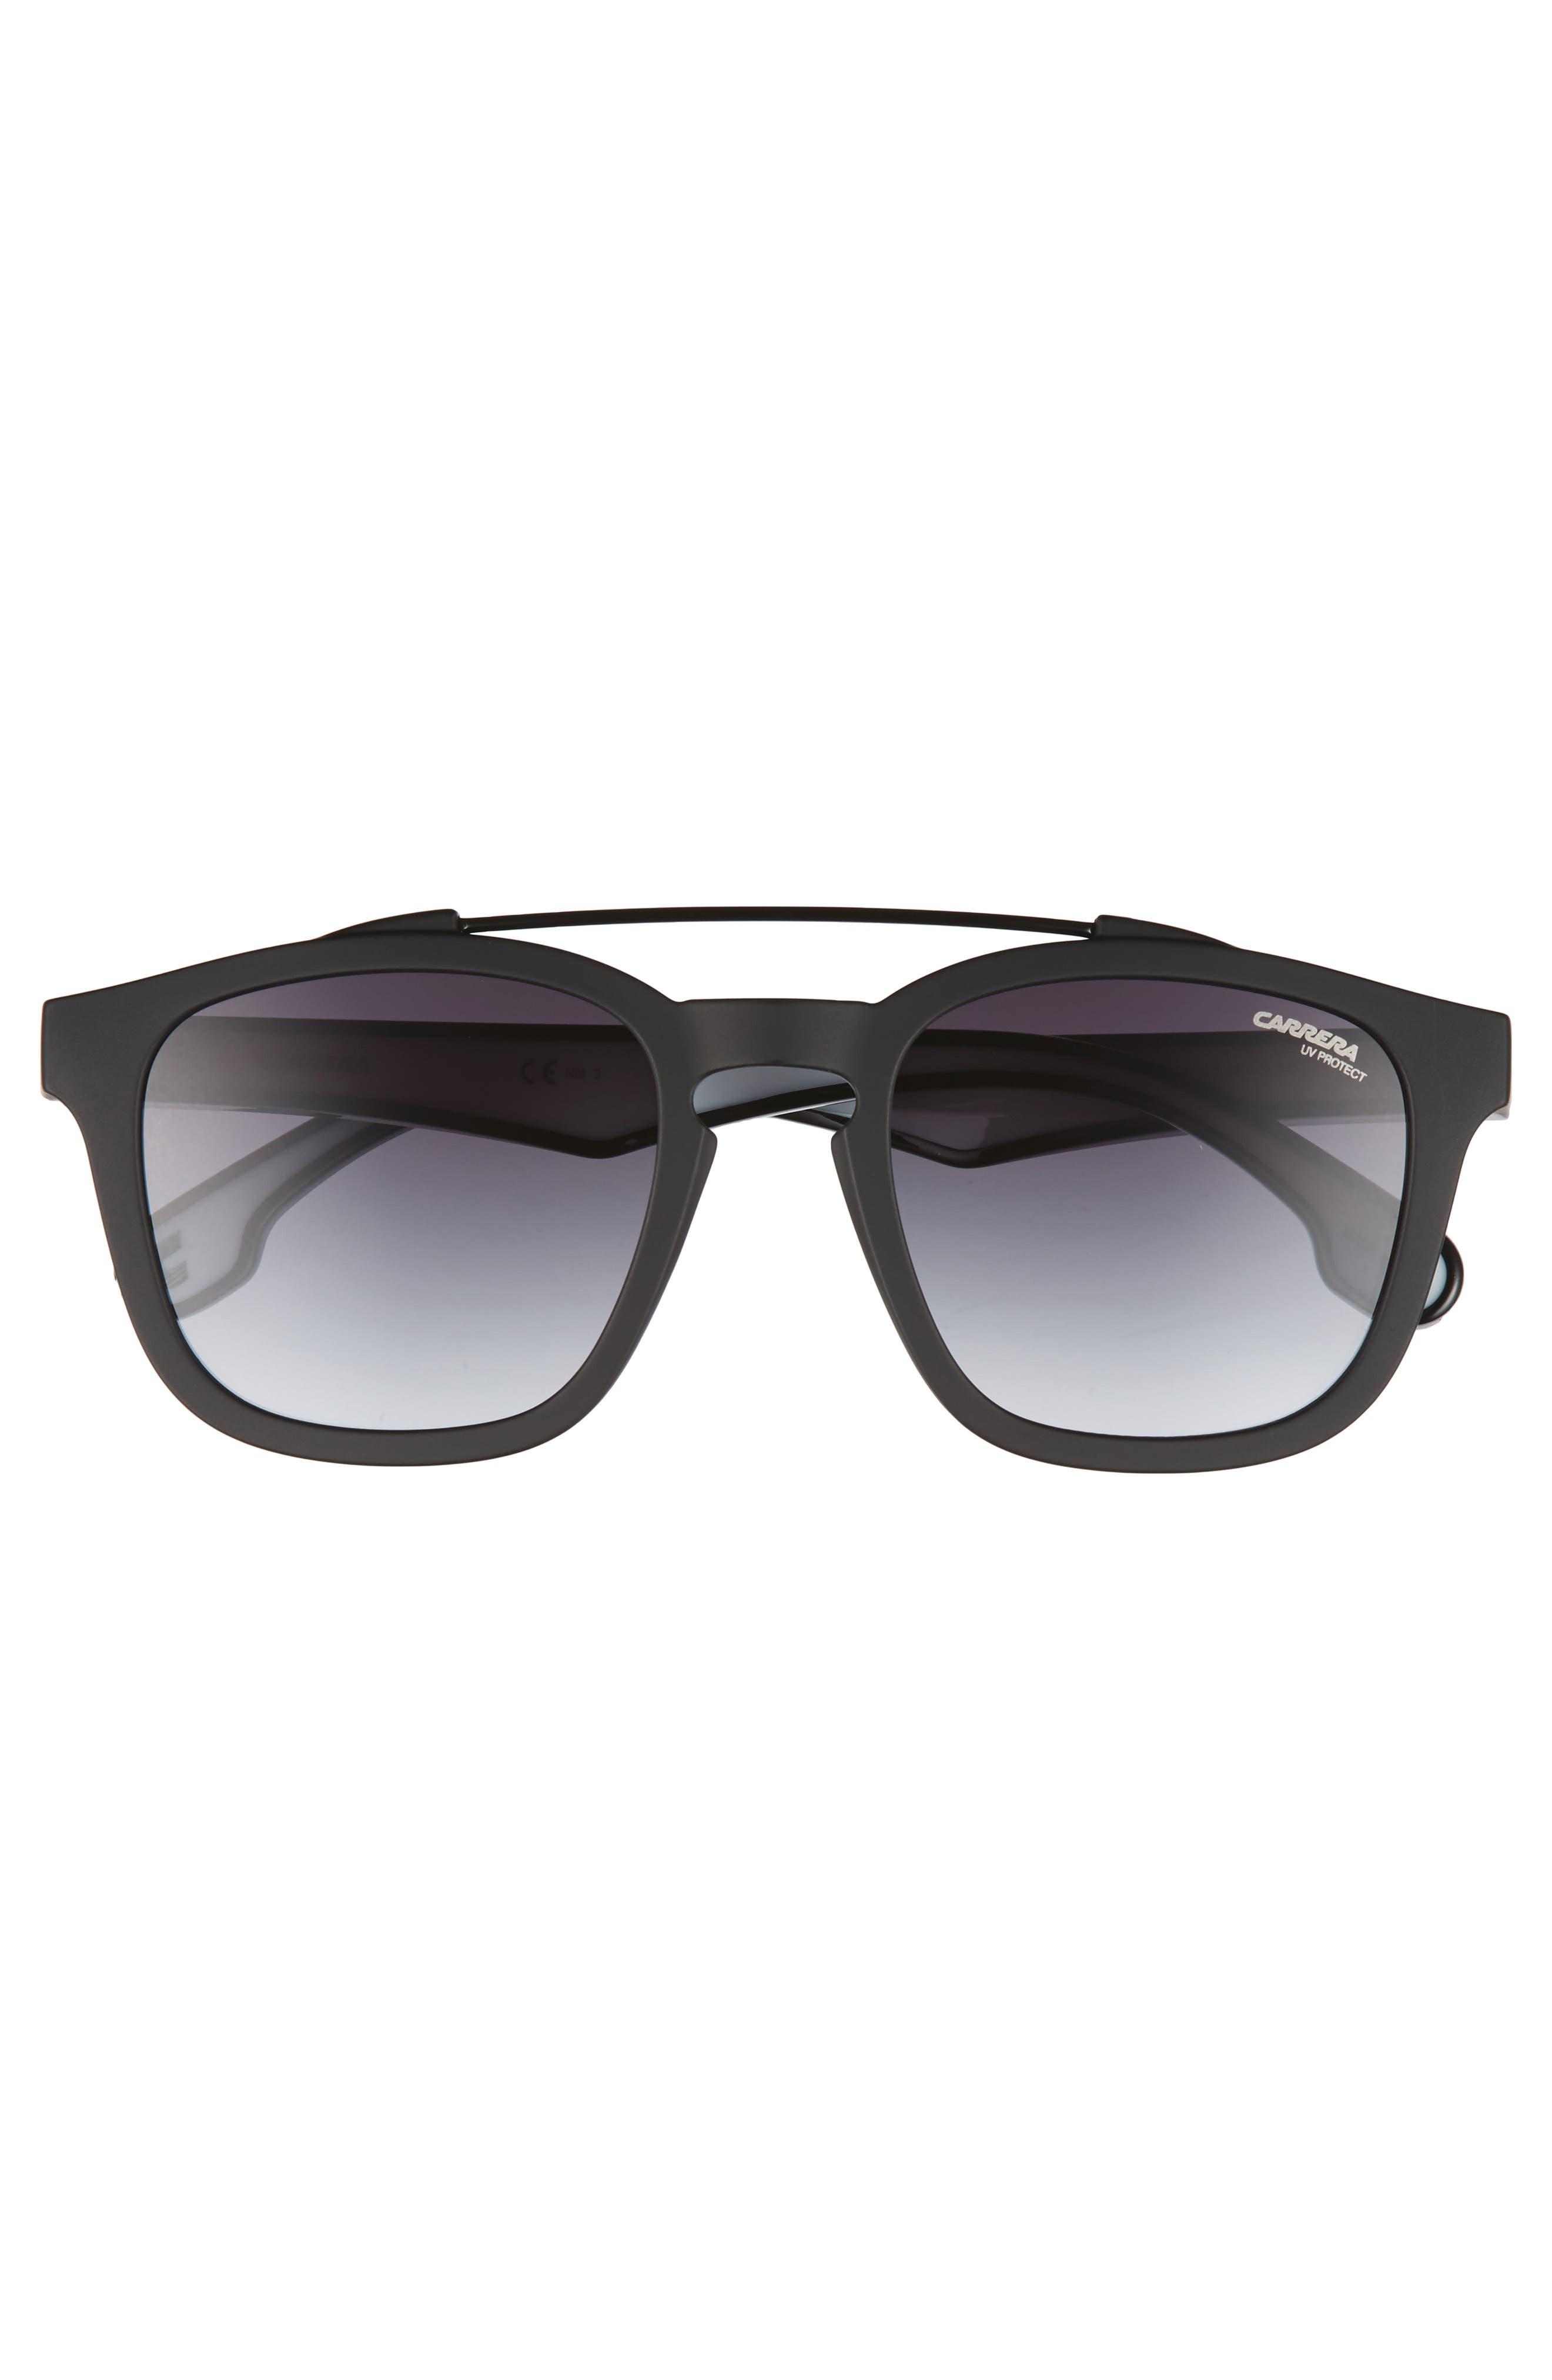 1011S Sunglasses,                             Alternate thumbnail 2, color,                             Matte Black/ Drk Gray Gradient